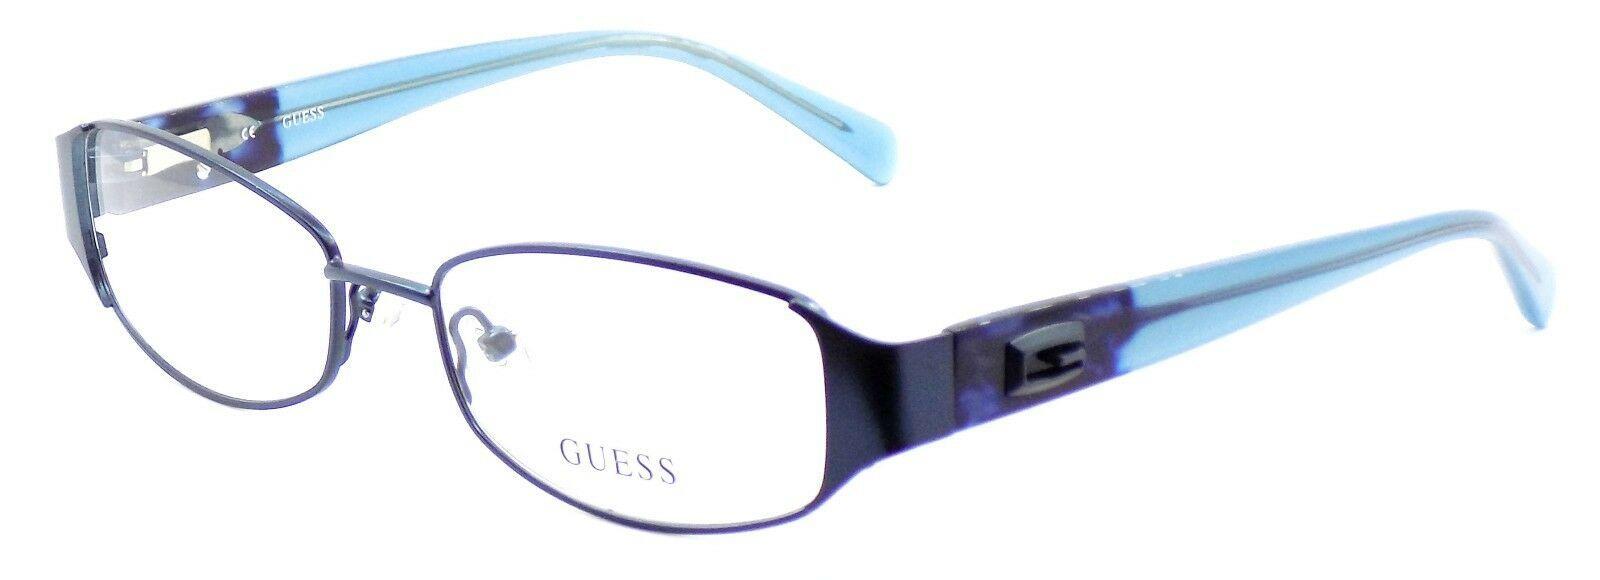 GUESS GU2411 BL Women's Eyeglasses Frames 52-17-135 Blue + CASE - $54.25